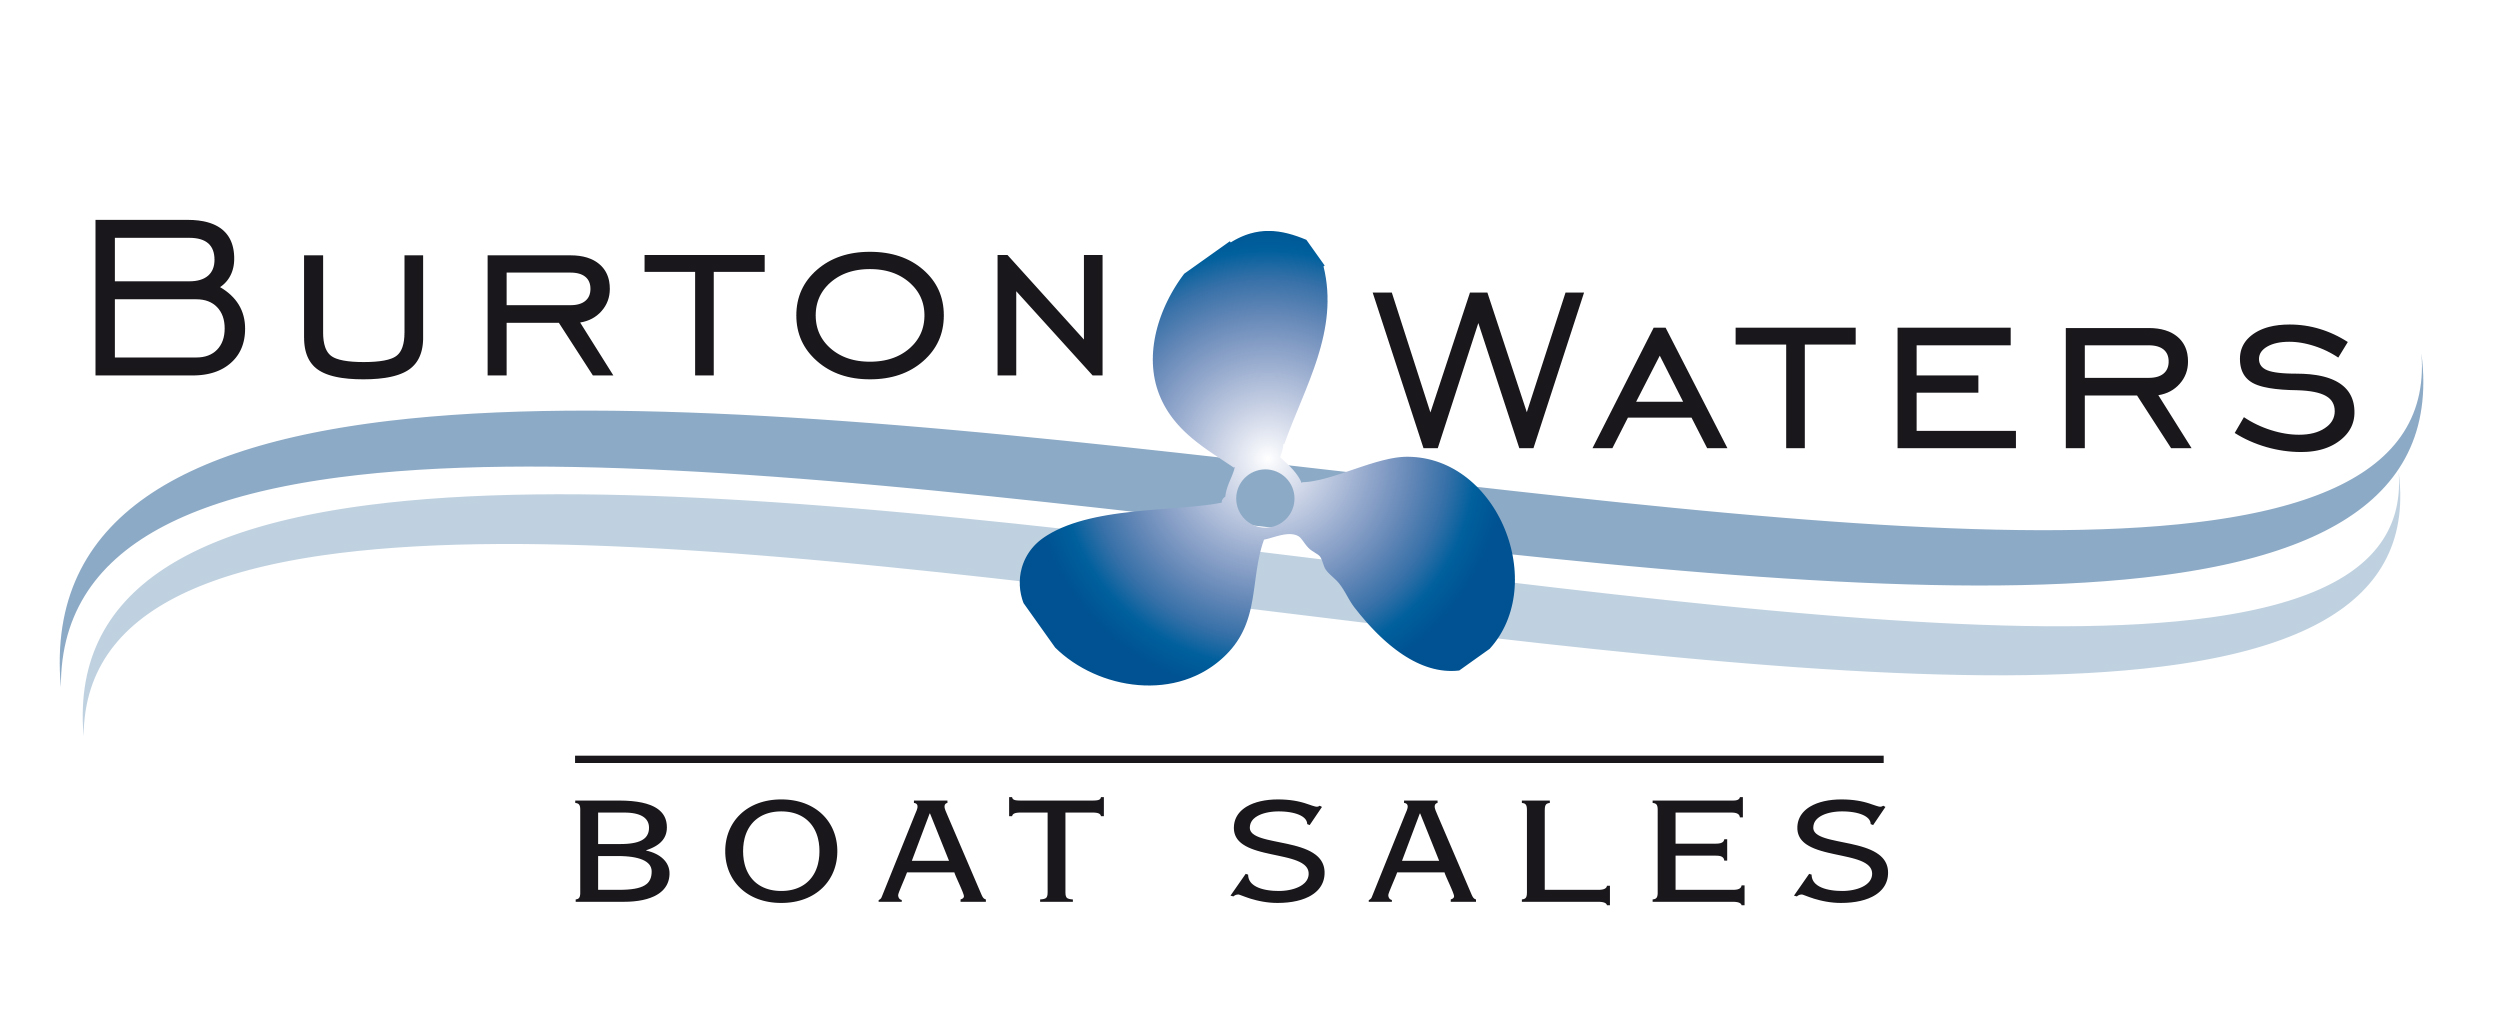 BURTON WATERS BOAT SALES